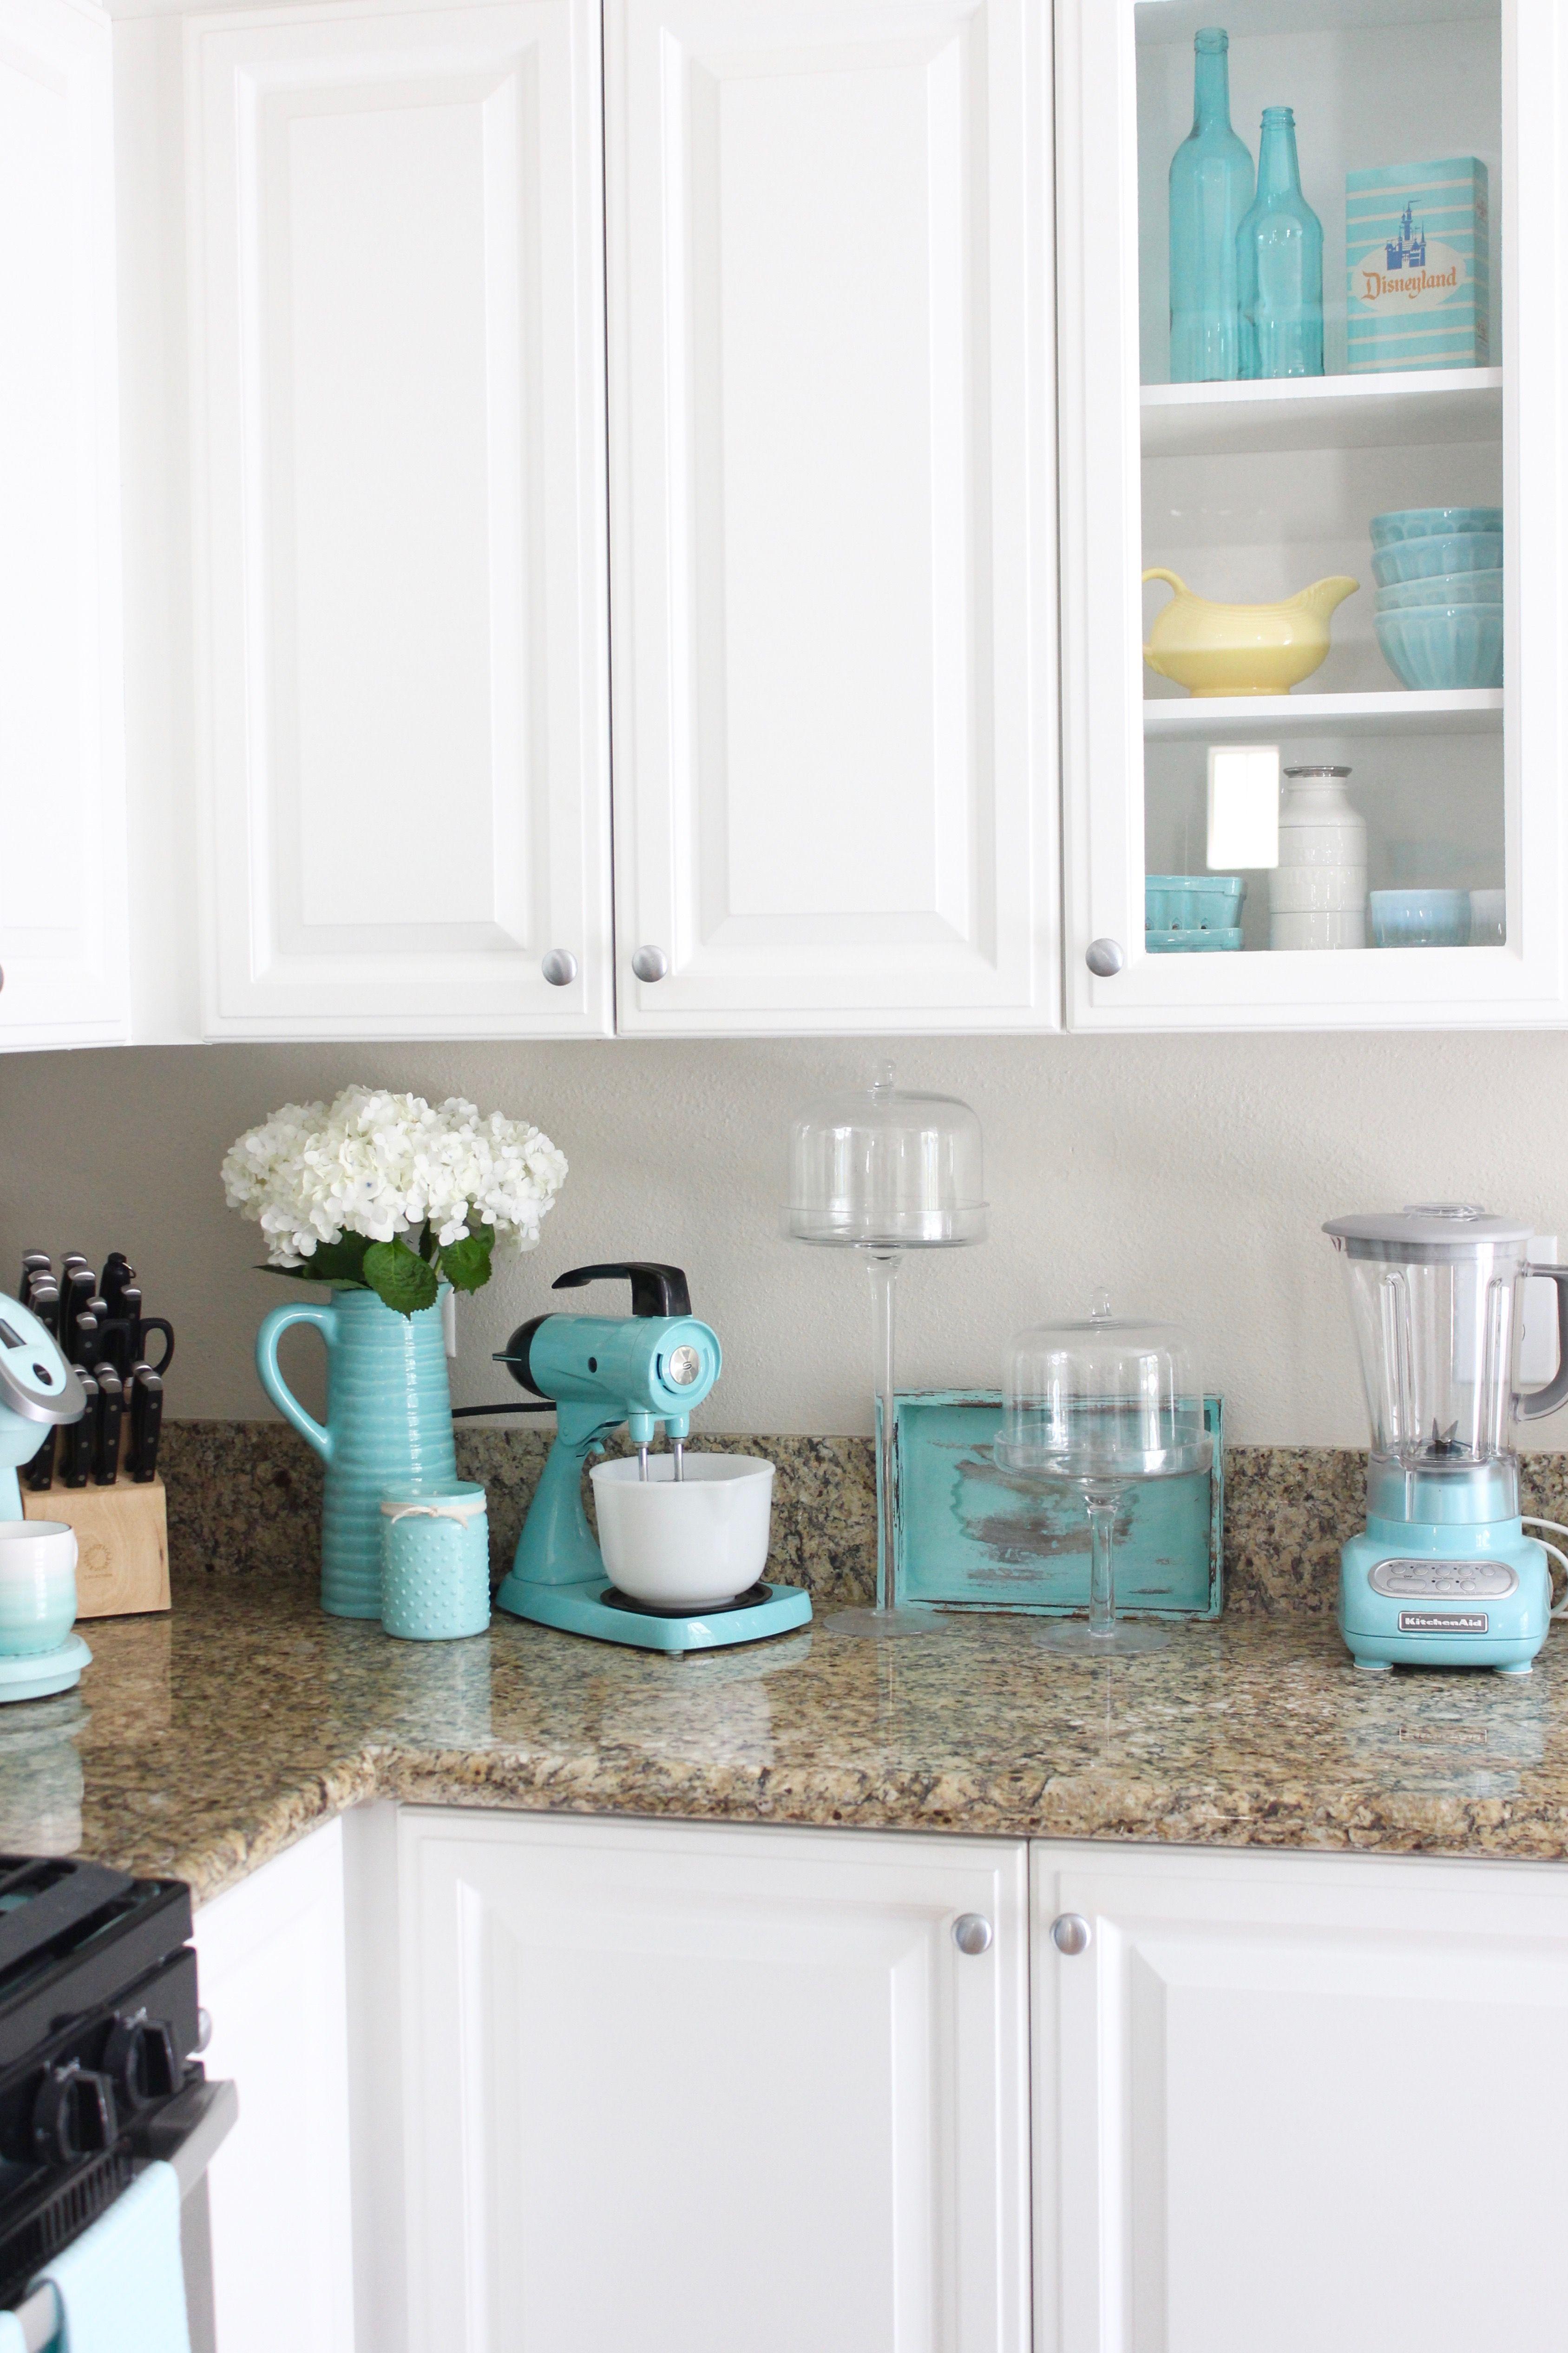 Breezy S Favorite Kitchen Finds Breezy Designs Blue Kitchen Decor Aqua Kitchen Tiffany Blue Kitchen